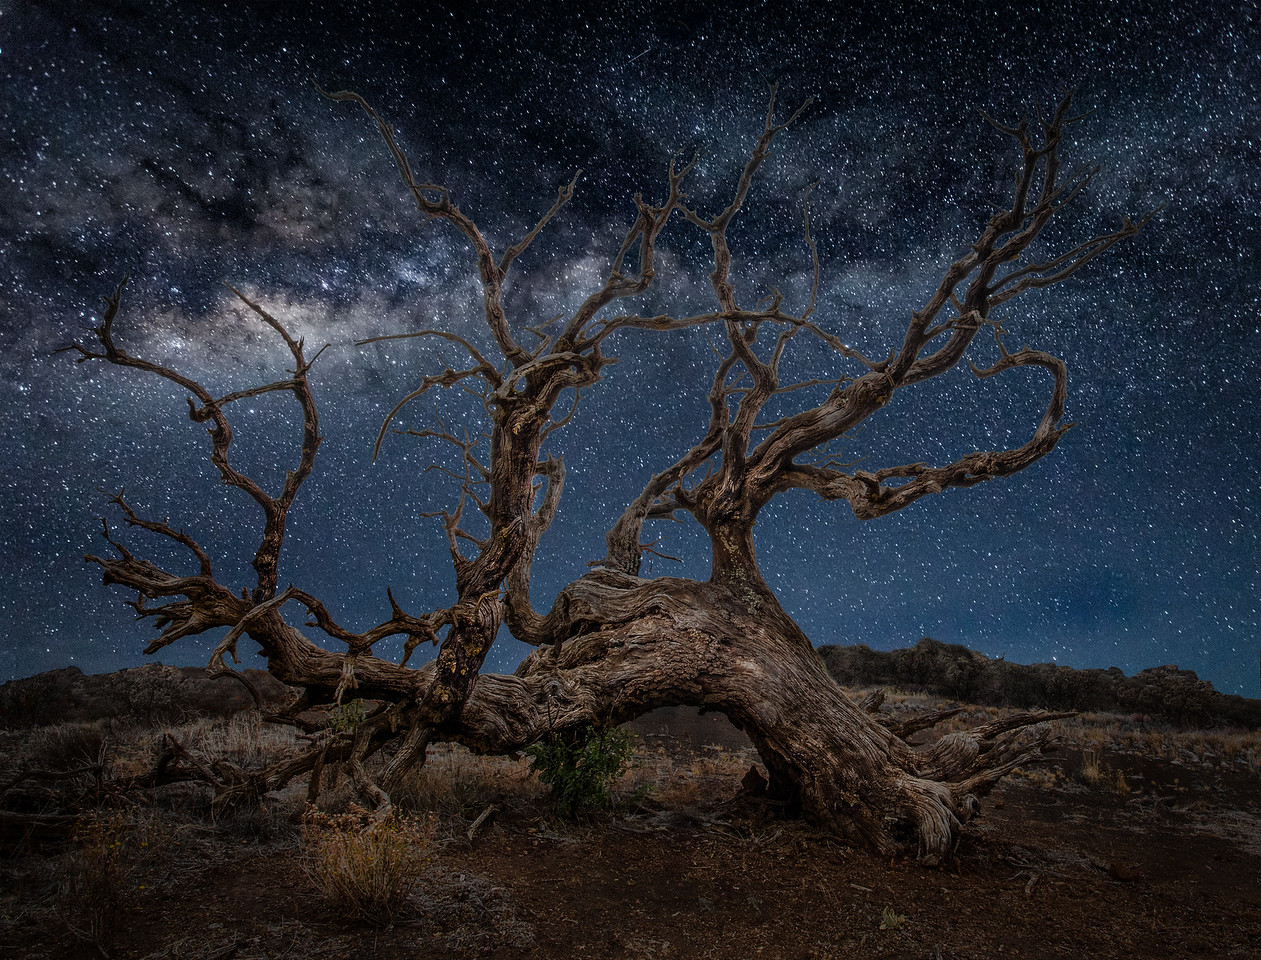 Night on Mauna Kea